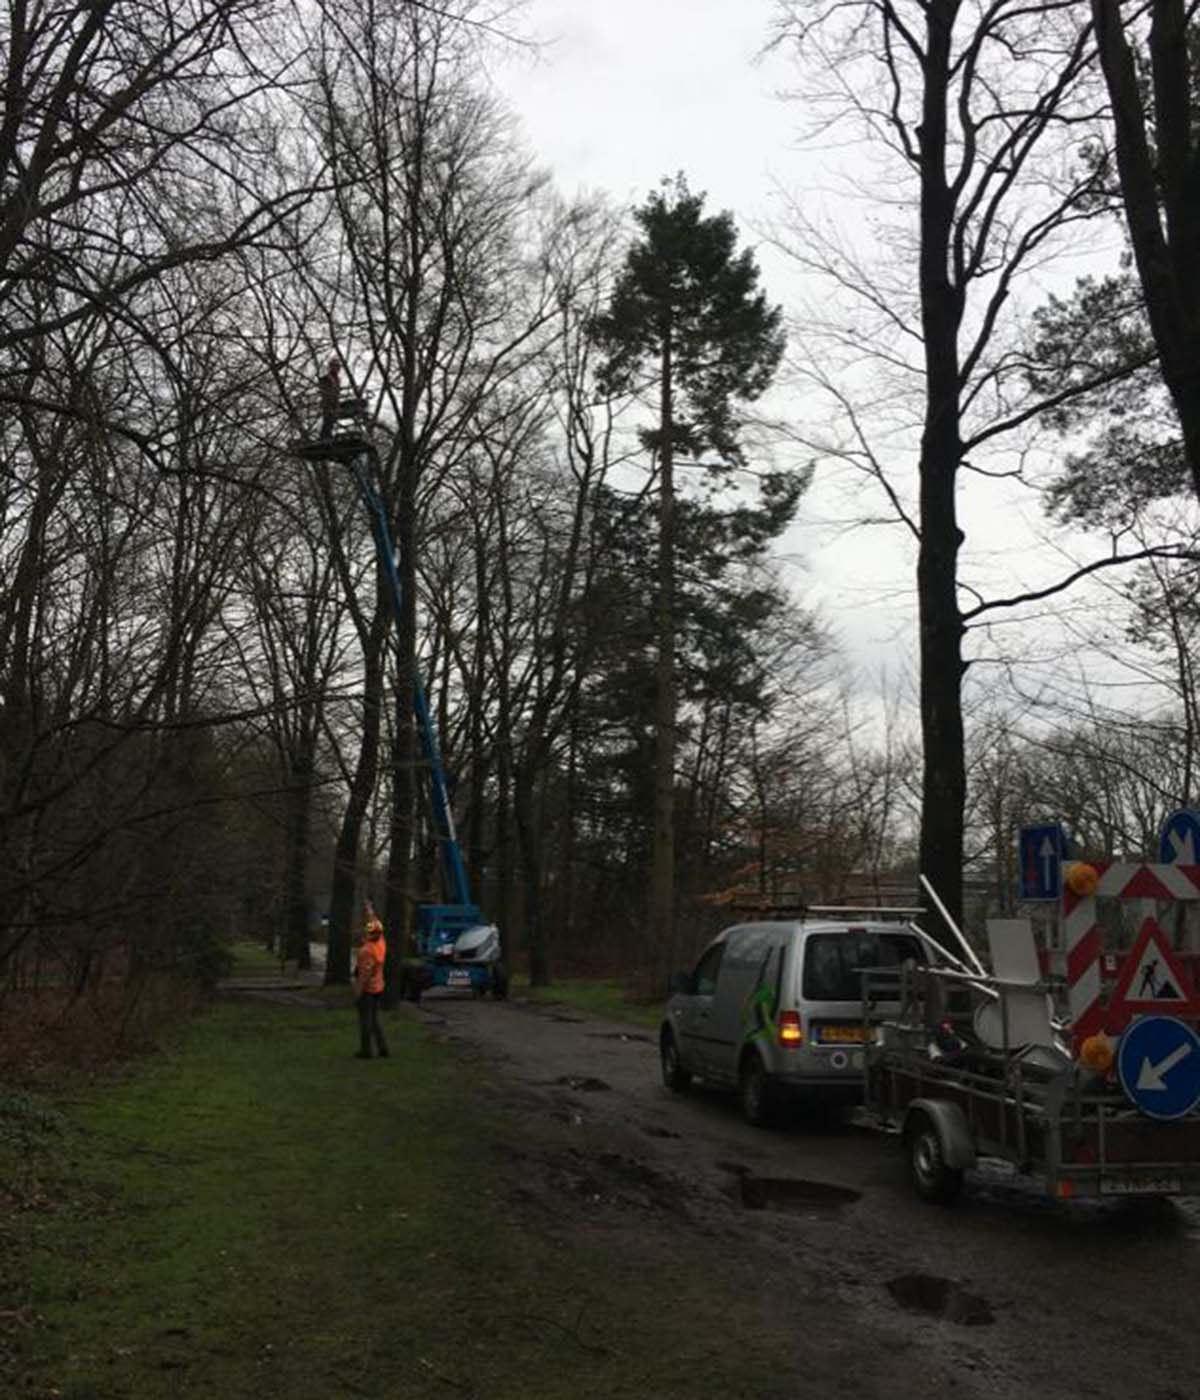 Hoefakker boomspecialisten - snoeiwerkzaamheden hoge bomen landgoed Valkenheide Maarsbergen 20-02-17 (2)